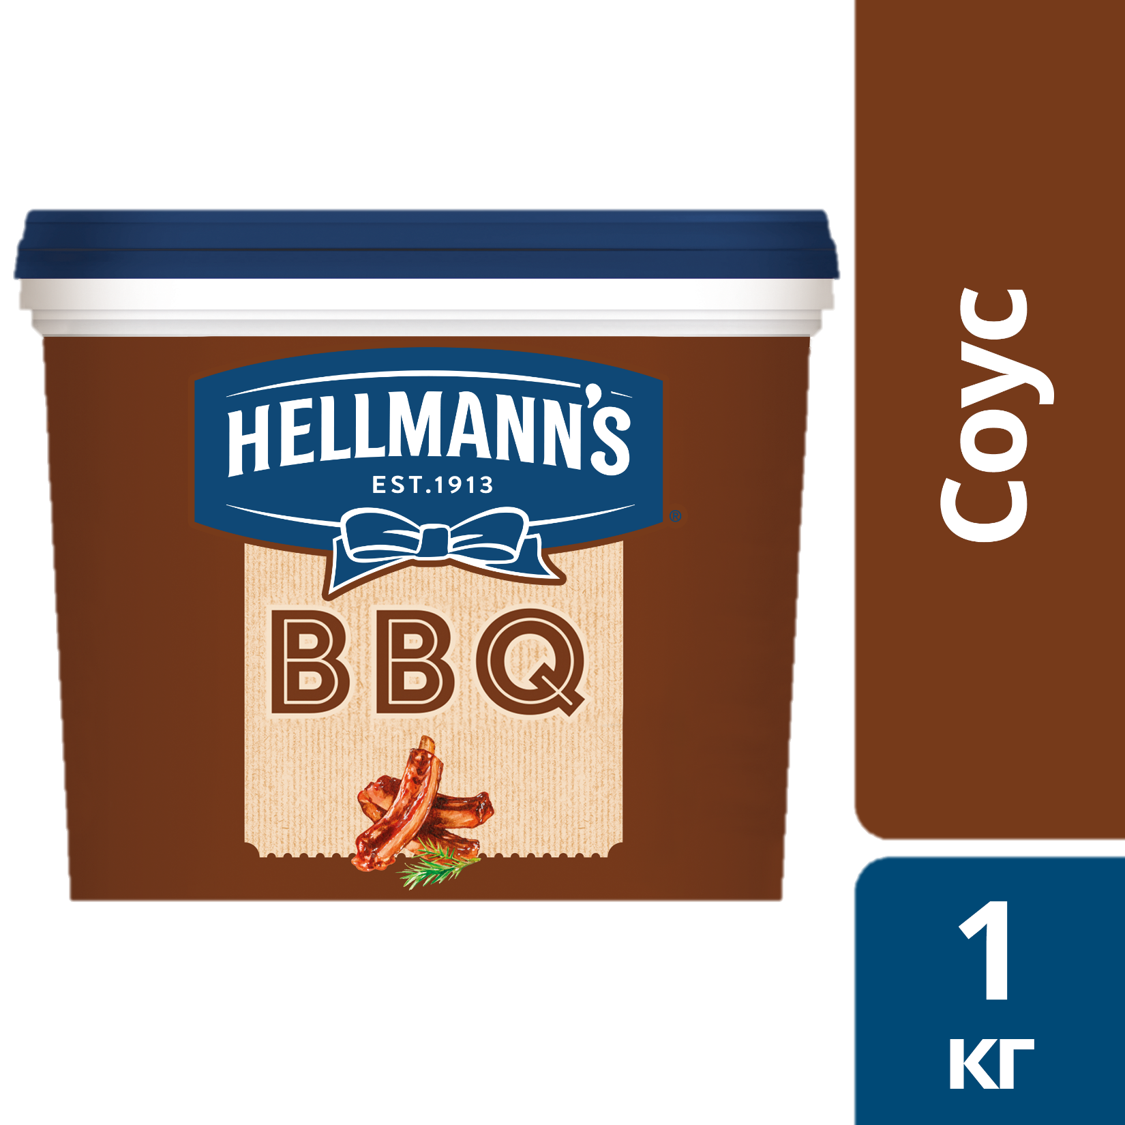 Hellmann's Соус Барбекю, 1 кг